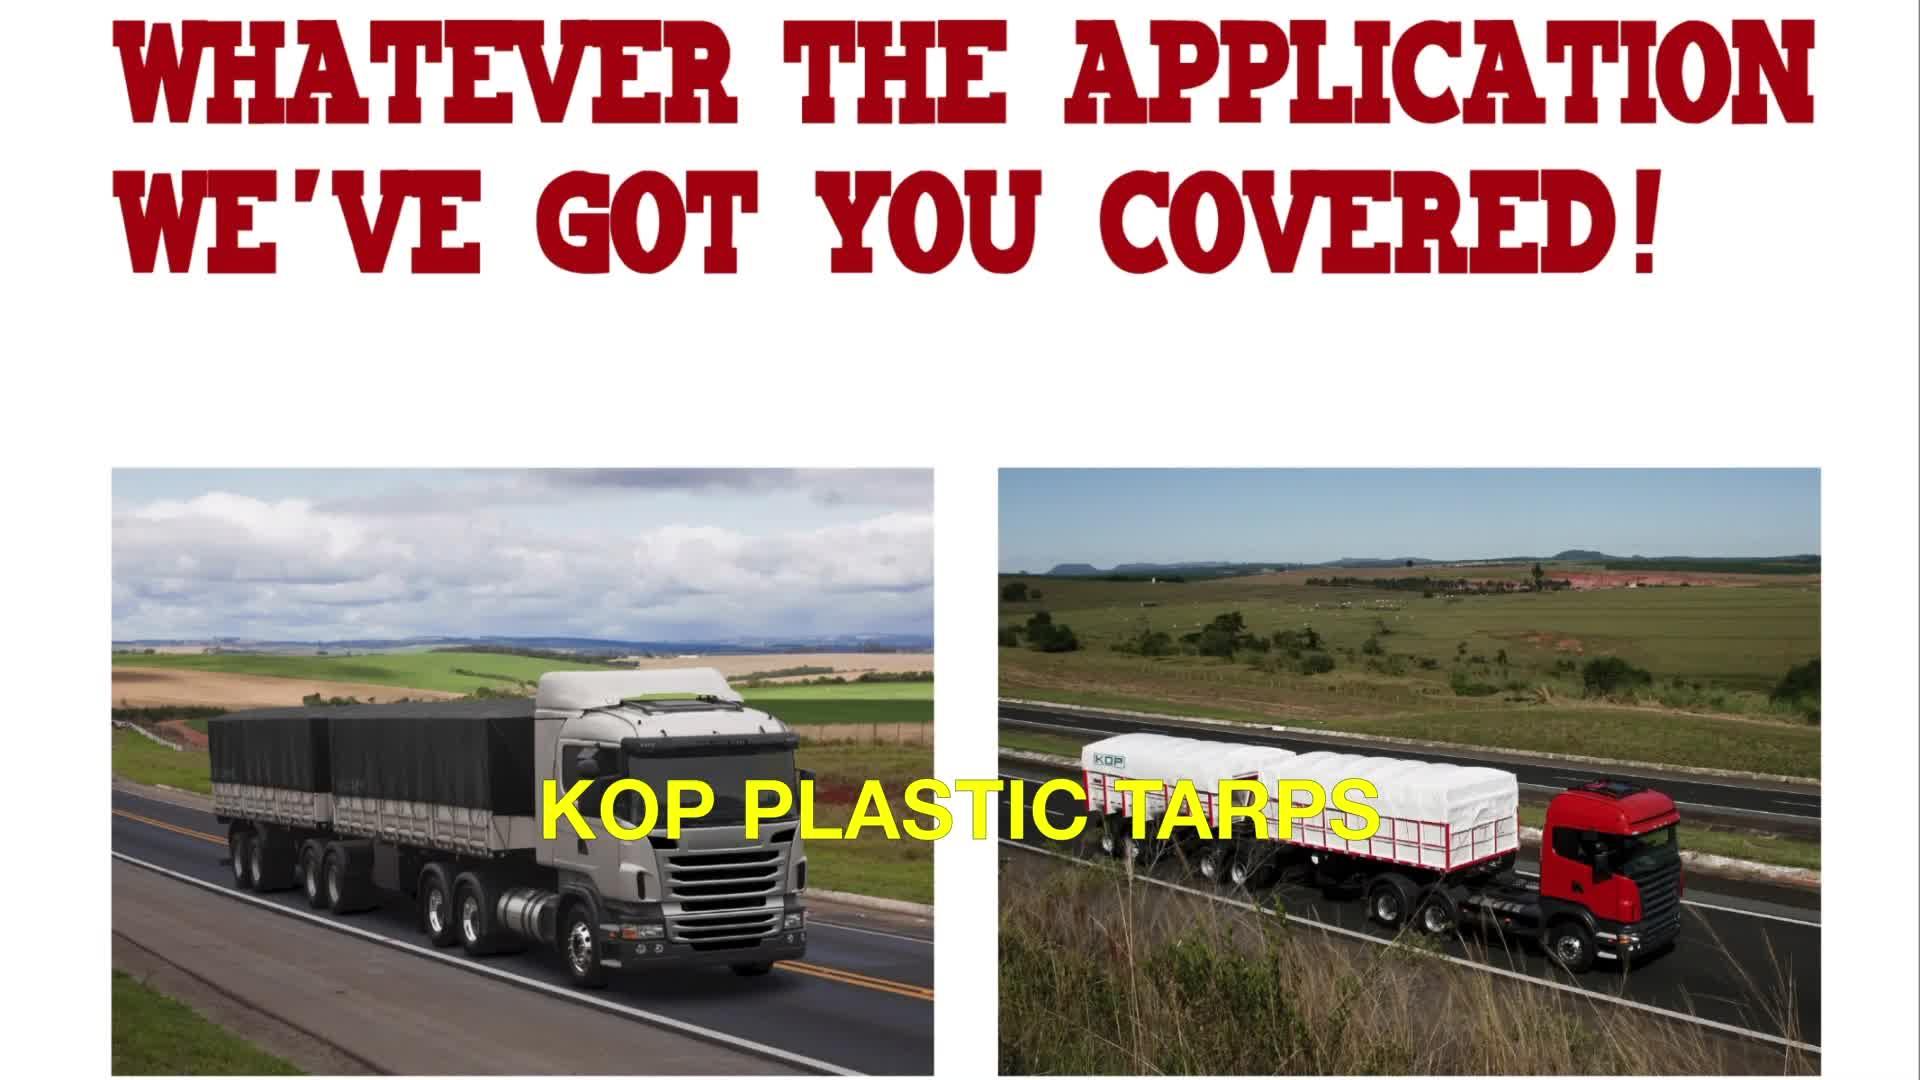 Custom Printed Tarps Online tarpaulin maker Print canvas Heavy duty canvas tarp with digital printing durable 8 years up outdoor